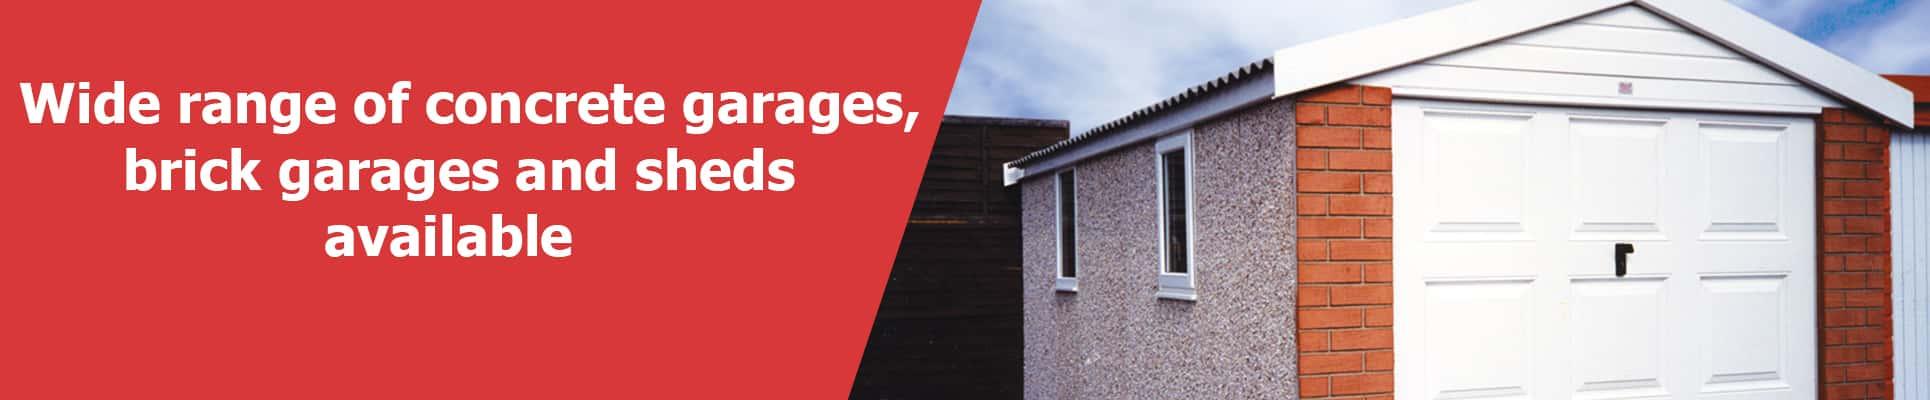 Dencroft Garages Slide Image - Garage Door